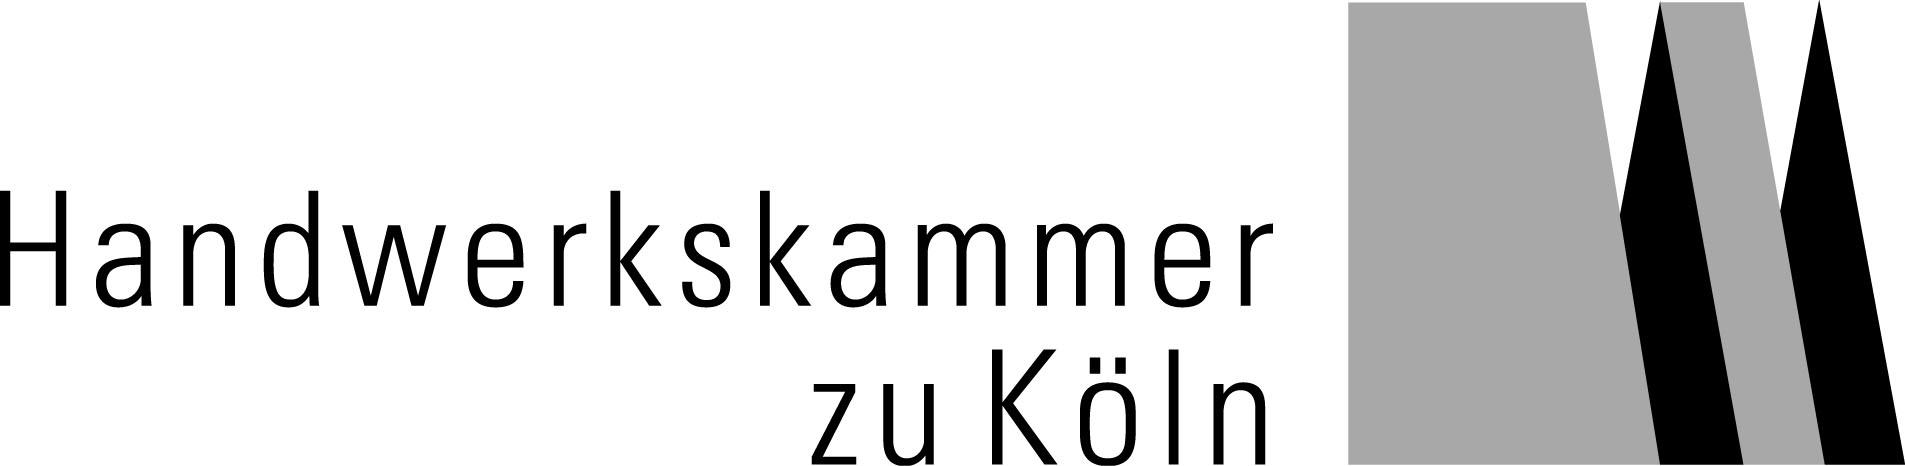 Hwk Zu Köln